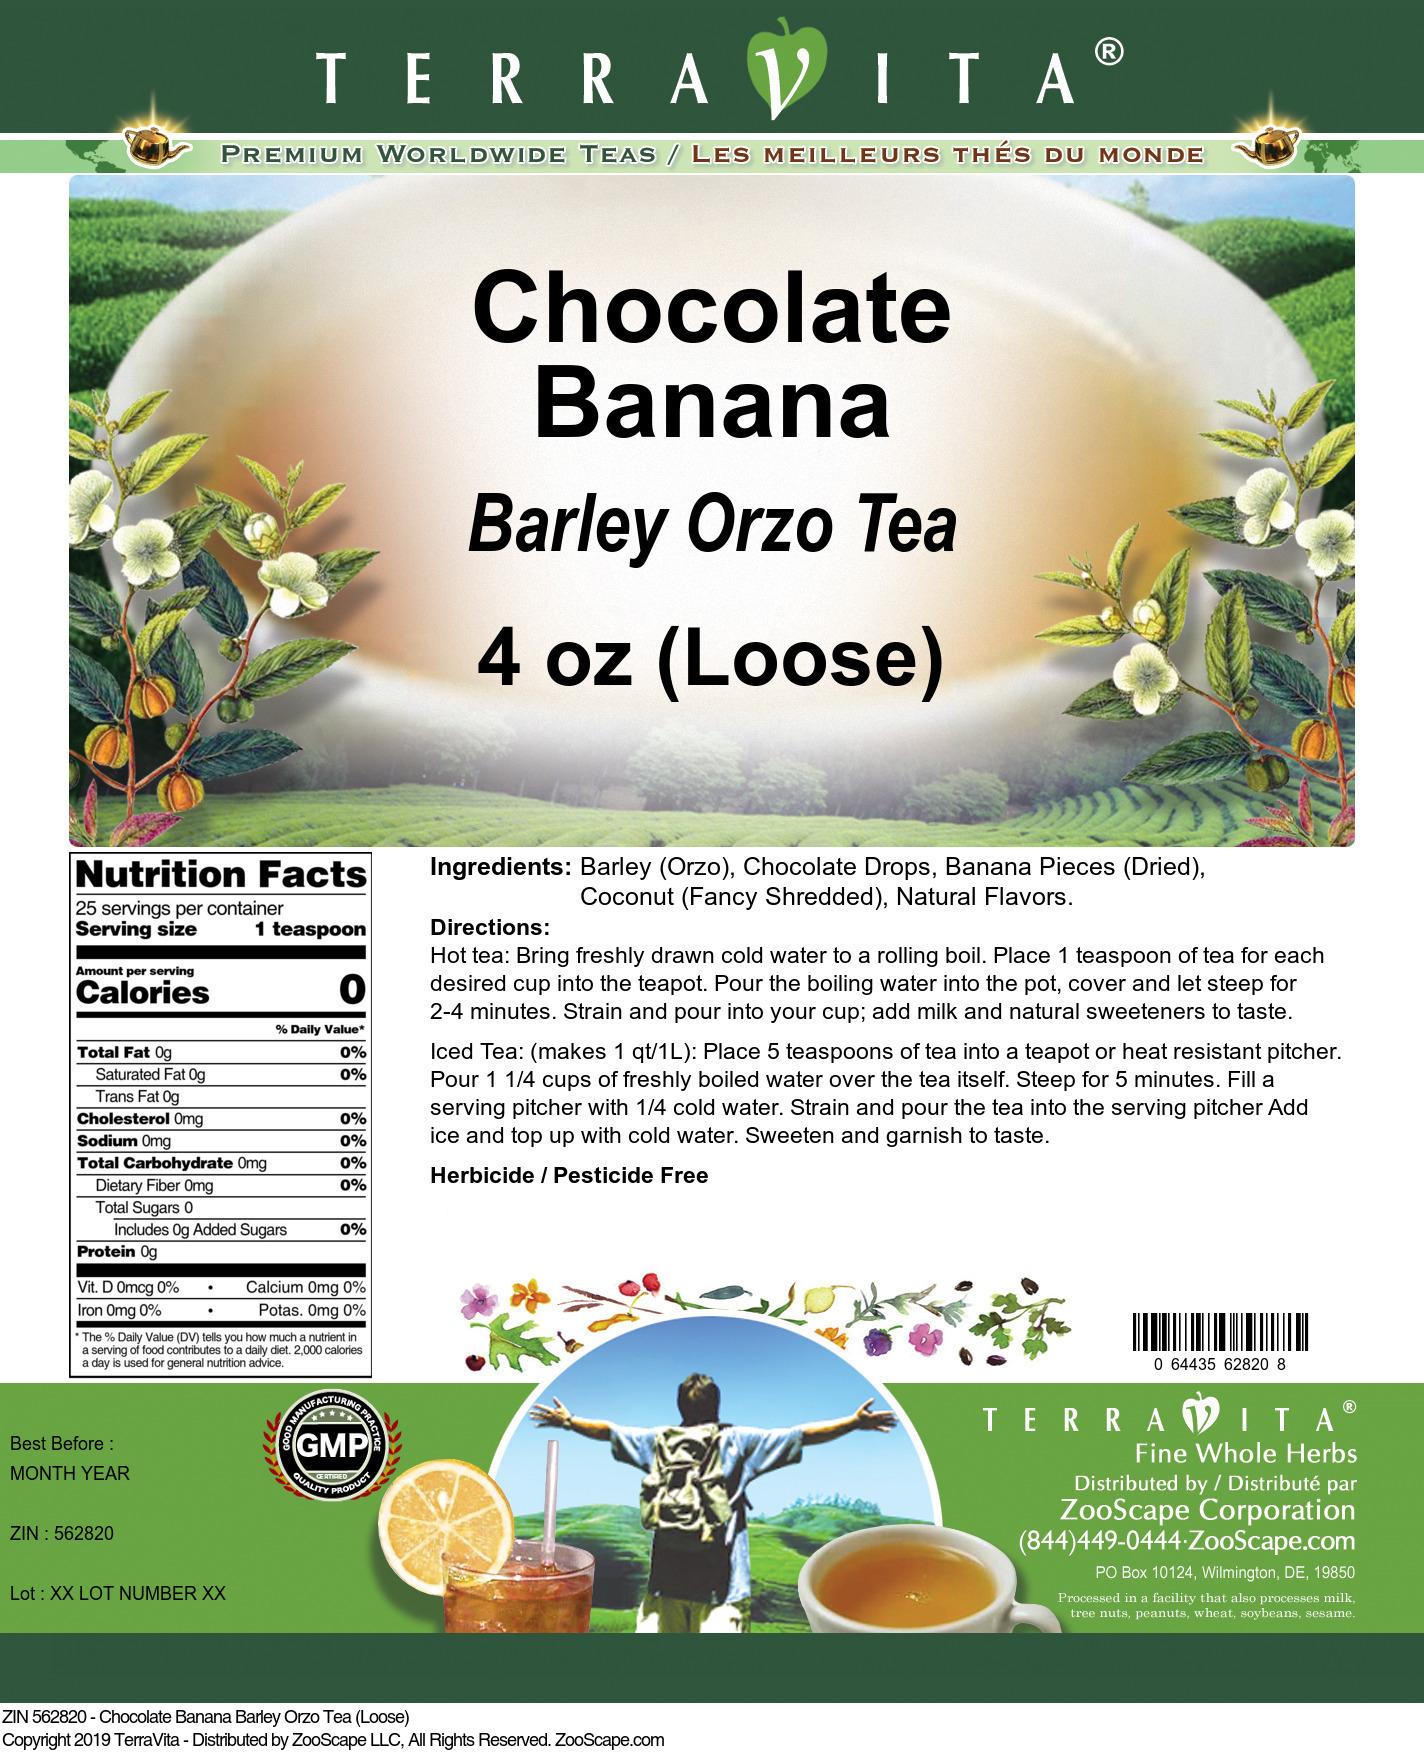 Chocolate Banana Barley Orzo Tea (Loose)